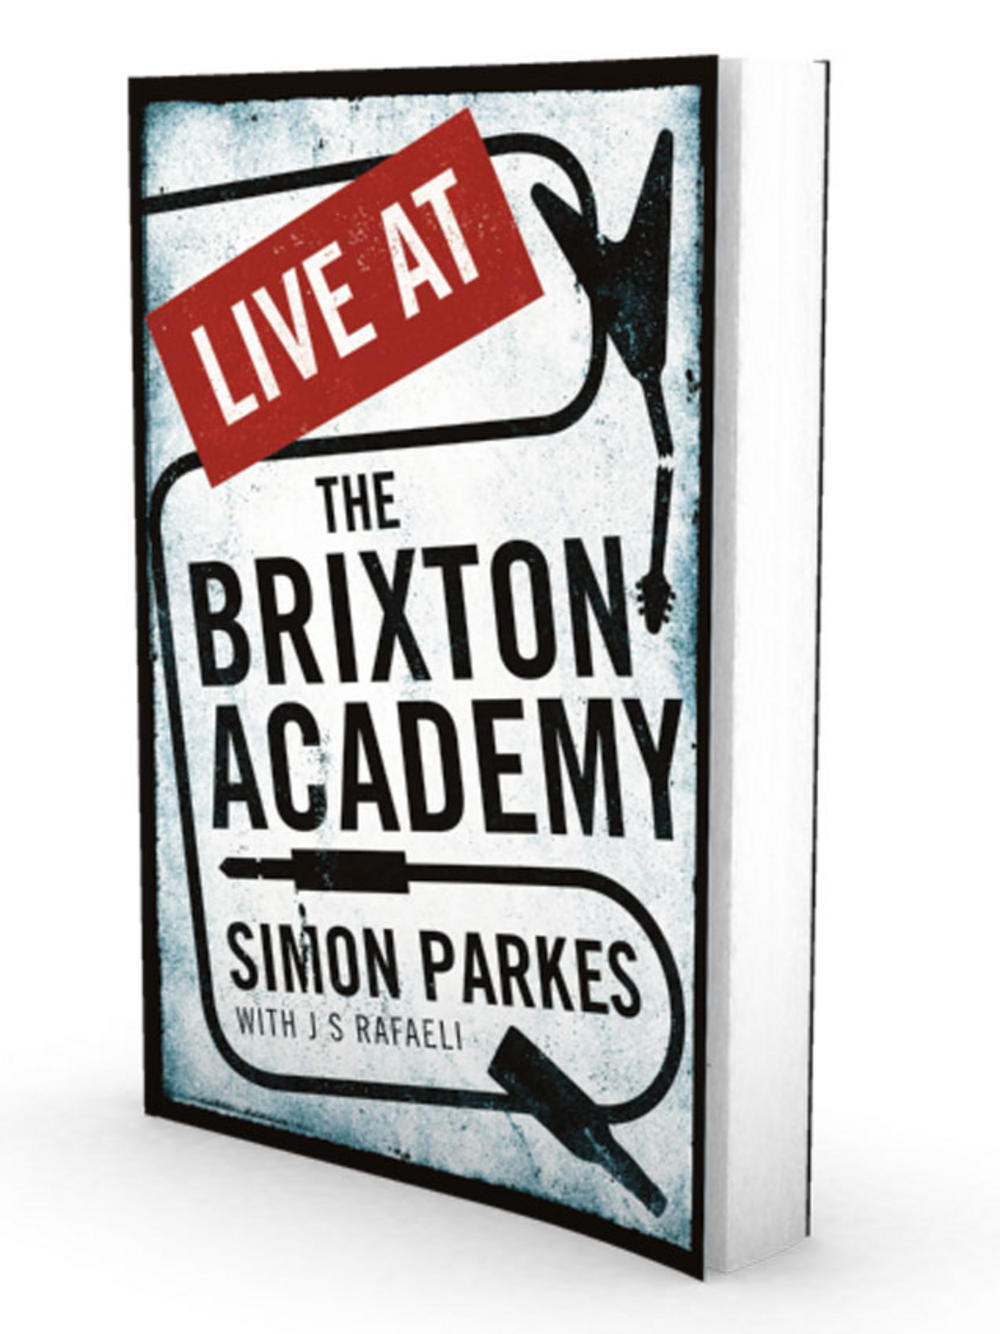 Brixton Academy (Live at Brixton Academy) Book